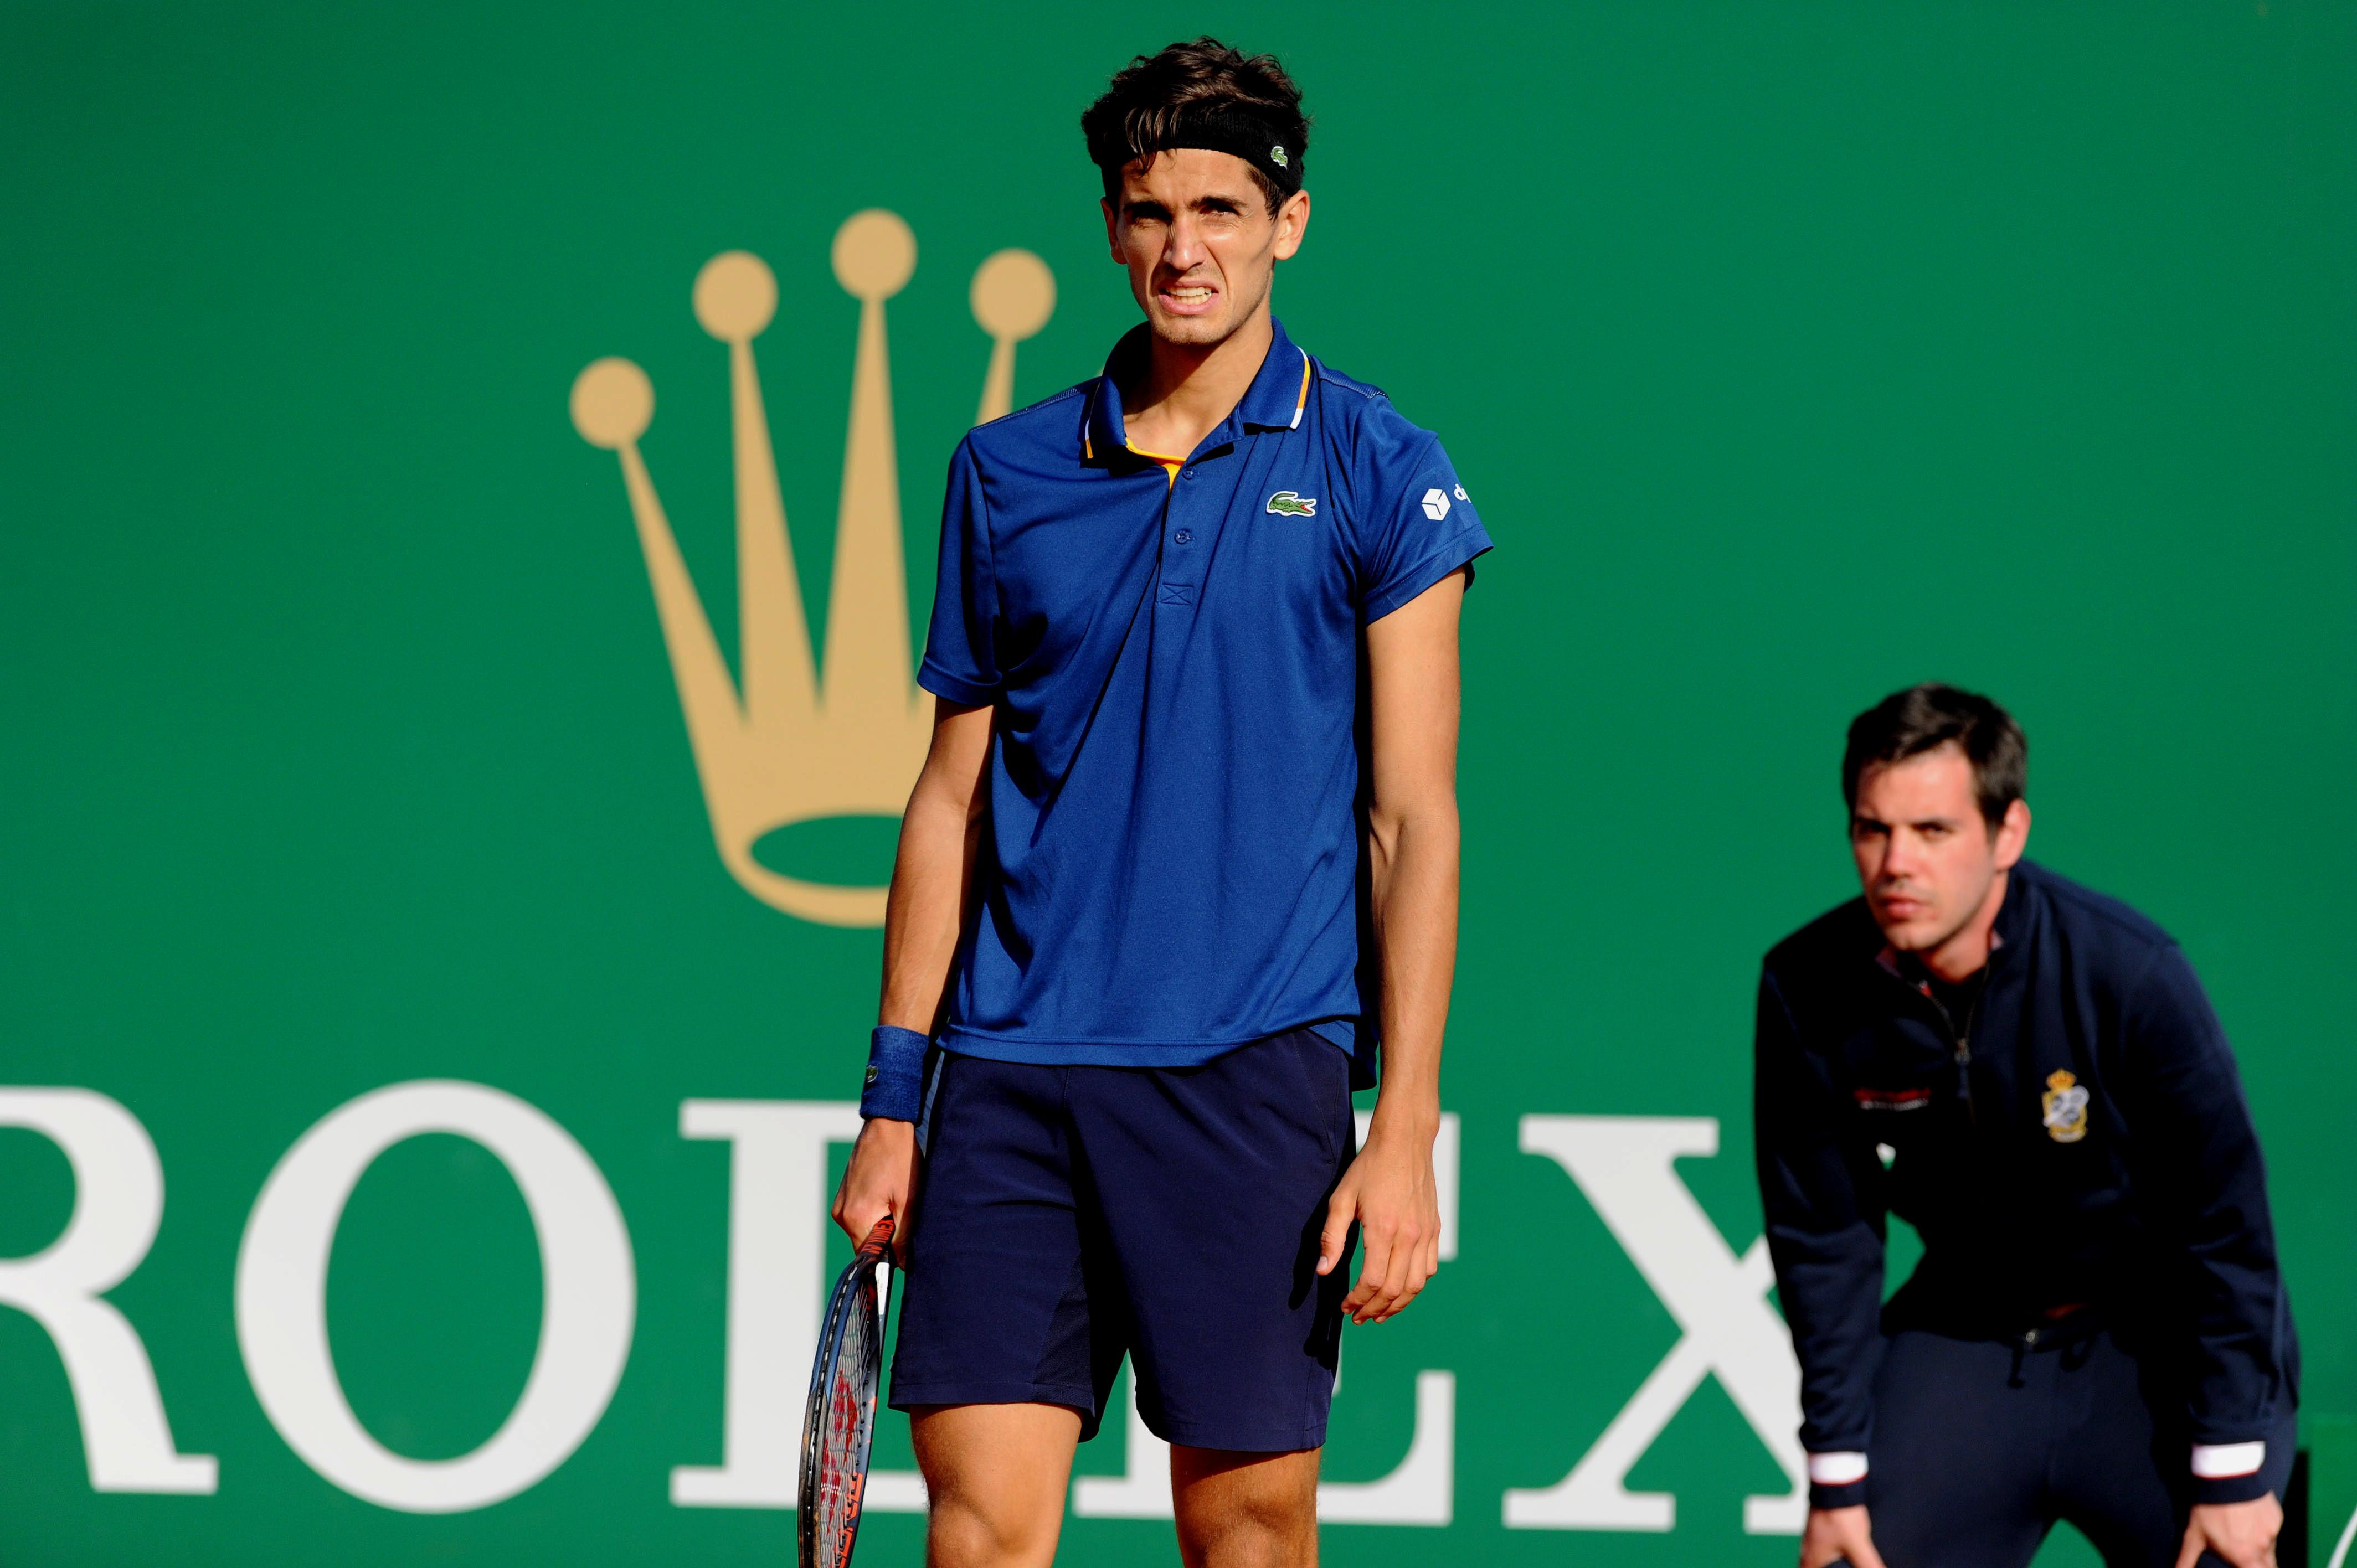 Tennis - ATP - Washington : Herbert proche de l'exploit, Murray confirme